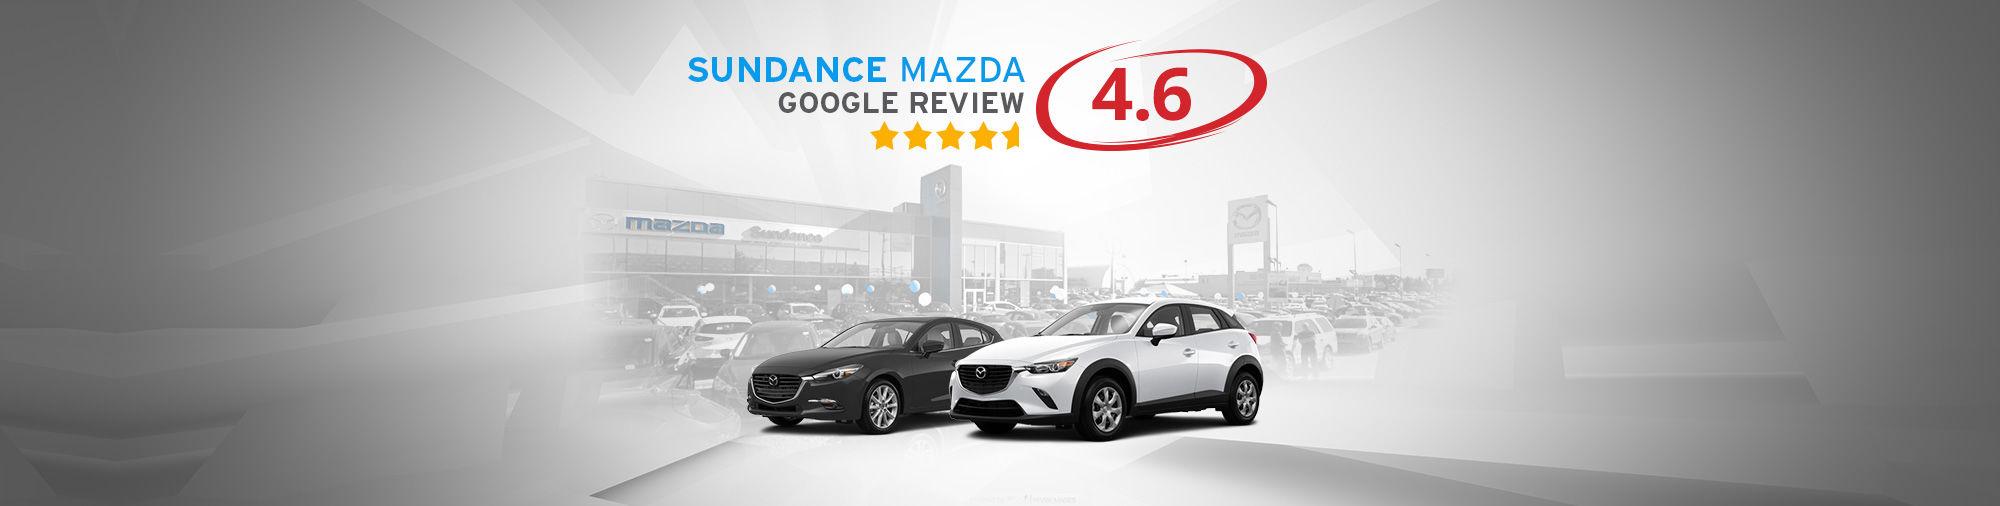 New Used Mazda Dealership In Edmonton Sundance Remote Car Starter For 5 Google Review